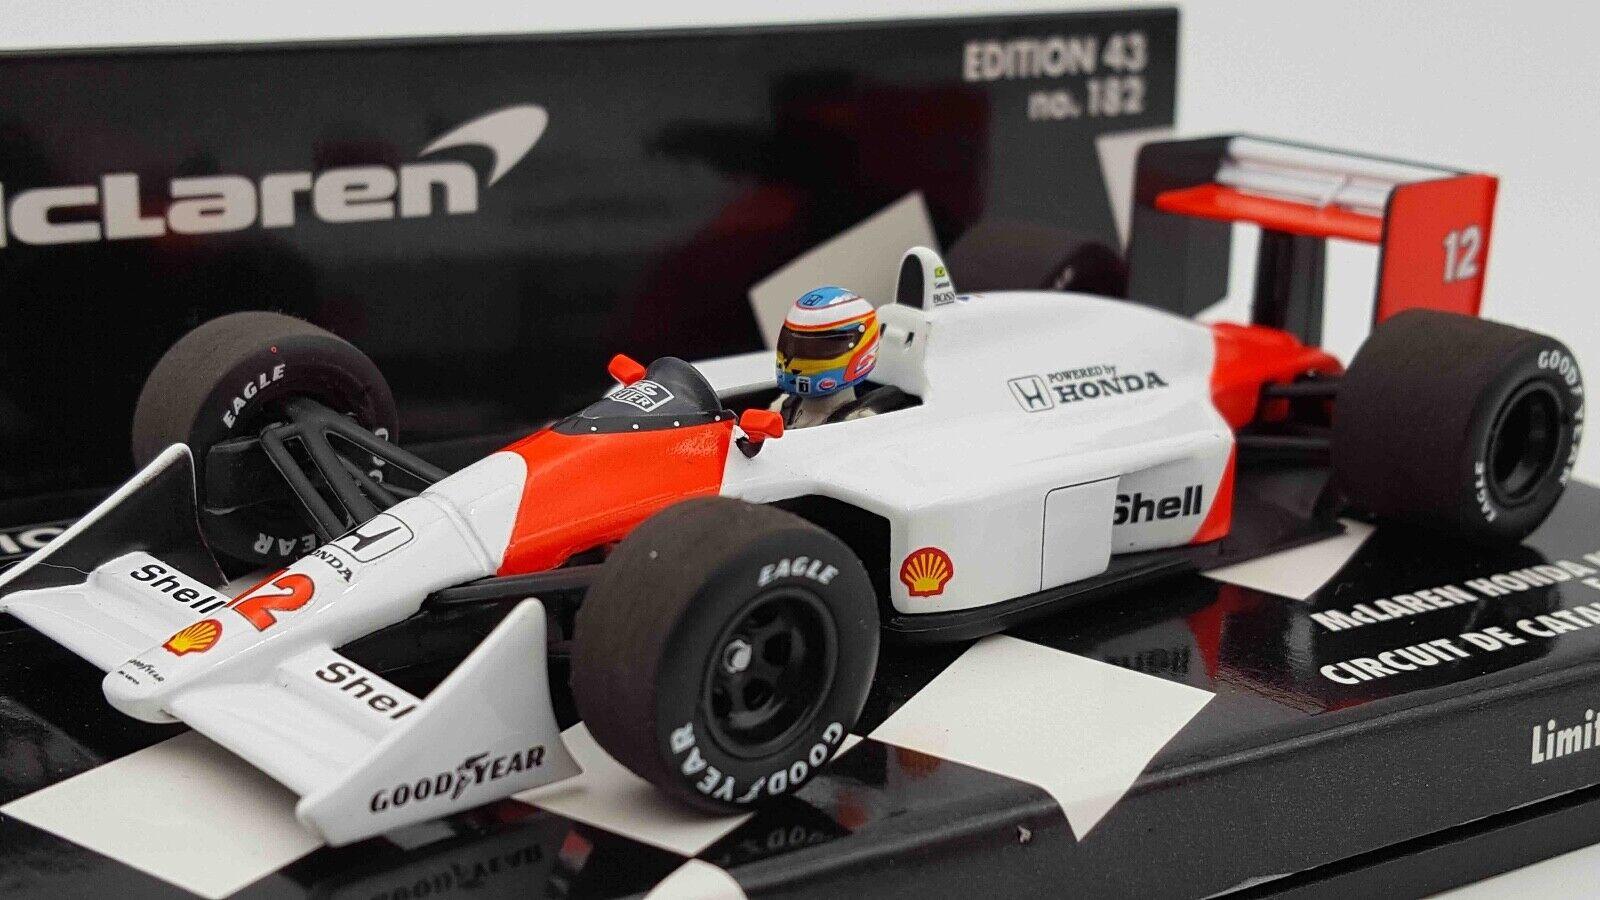 Minichamps 530884314 143 McLaren MP4 4 Fernando Alonso Circuit deCatalunya Model